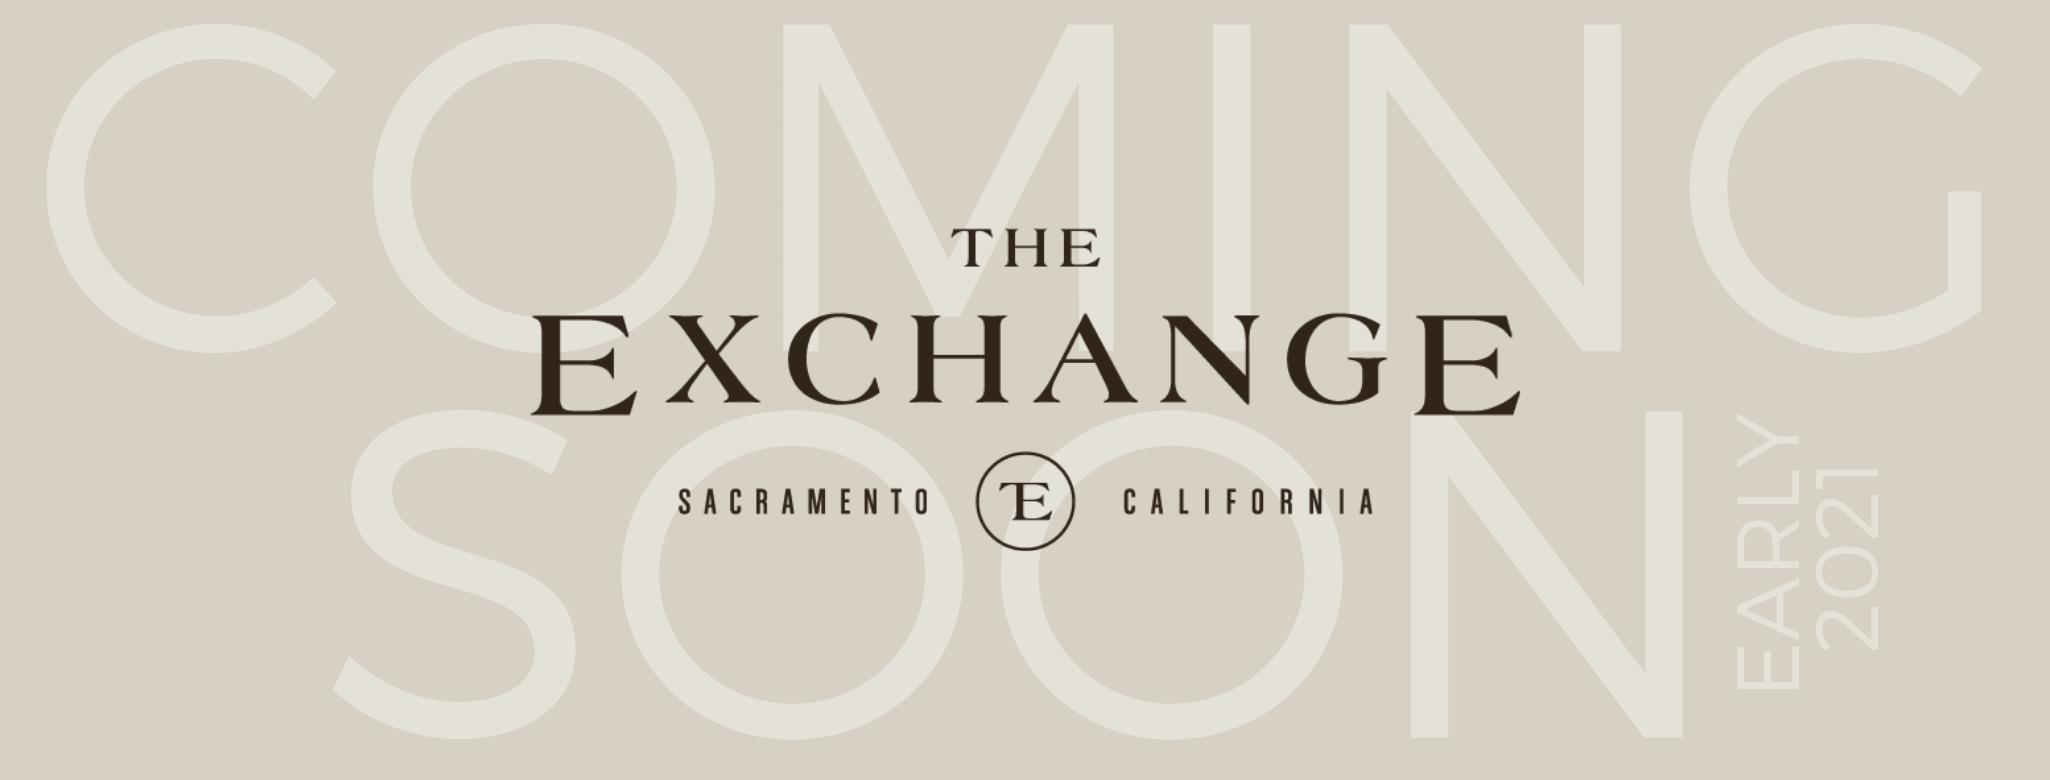 The Exchange Hotel